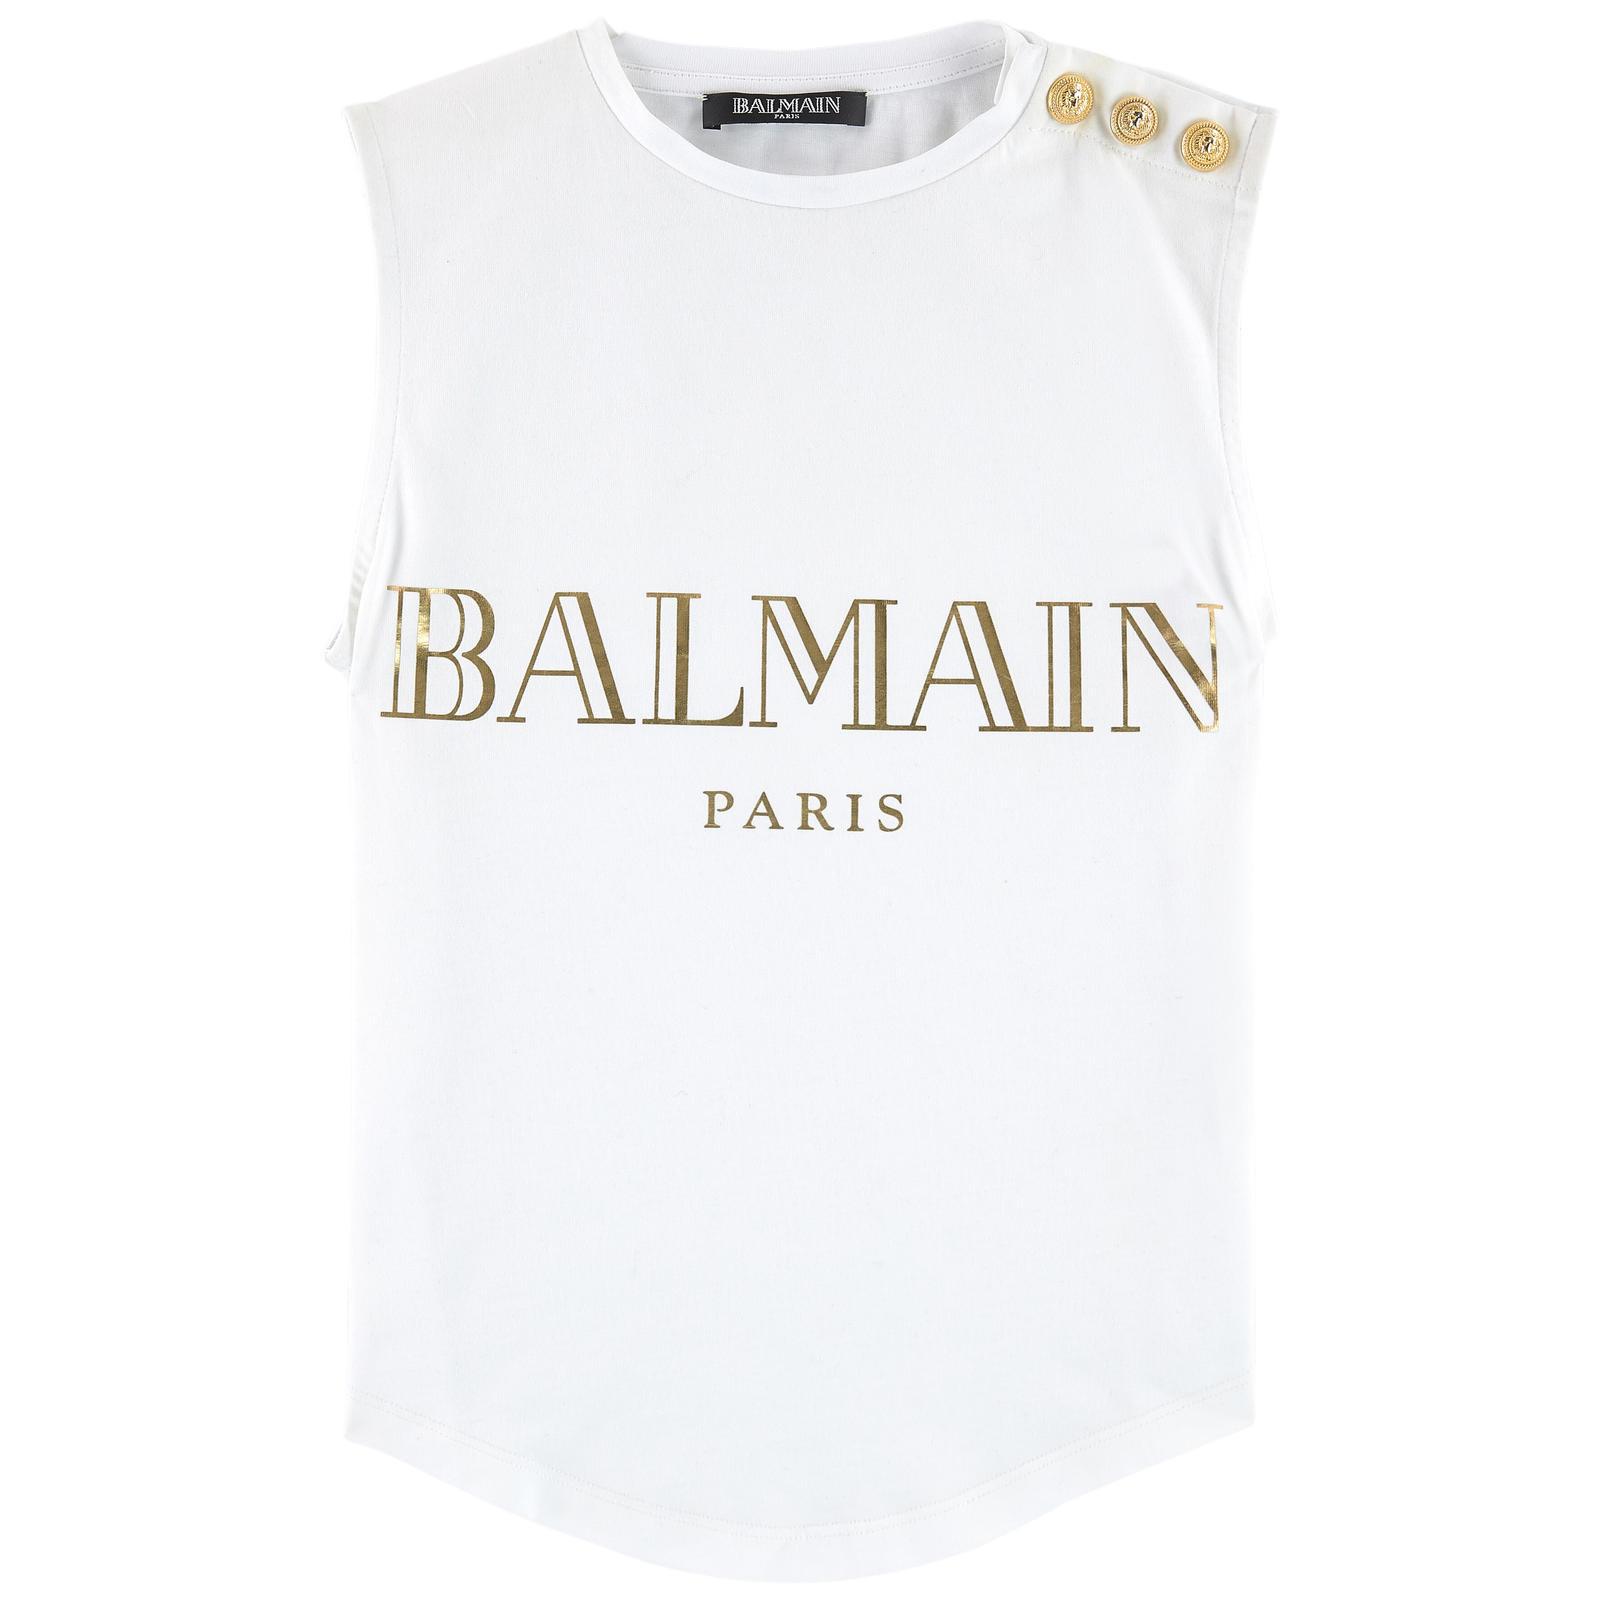 2423551ea Balmain White And Gold Sleeveless Tshirt   HEWI London